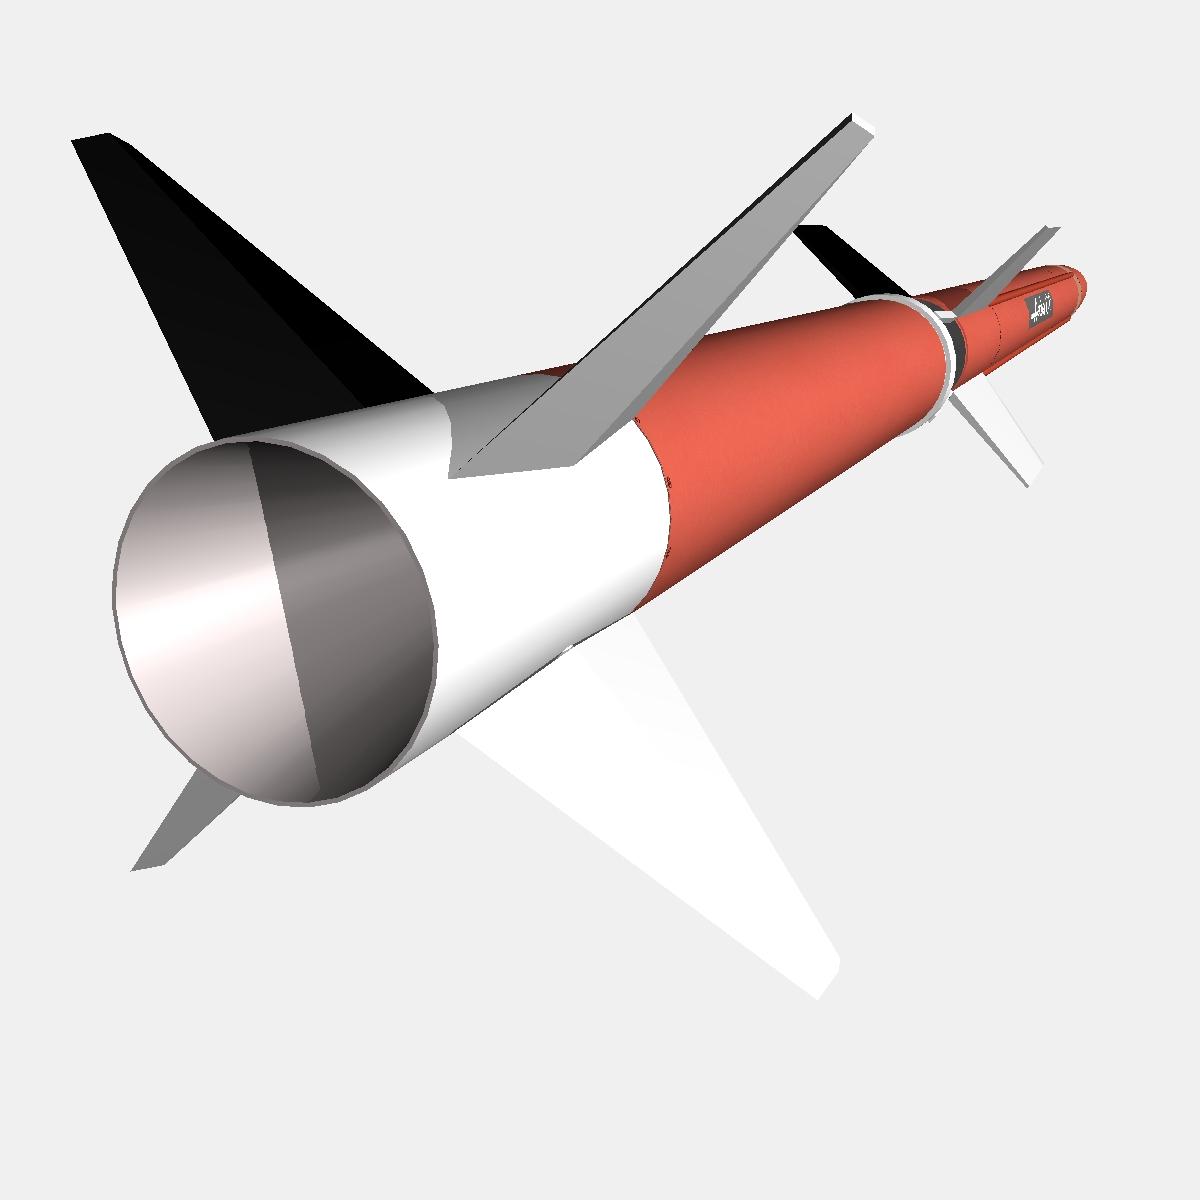 aerobee 170 rocket 3d model 3ds dxf fbx blend cob dae x  obj 166041